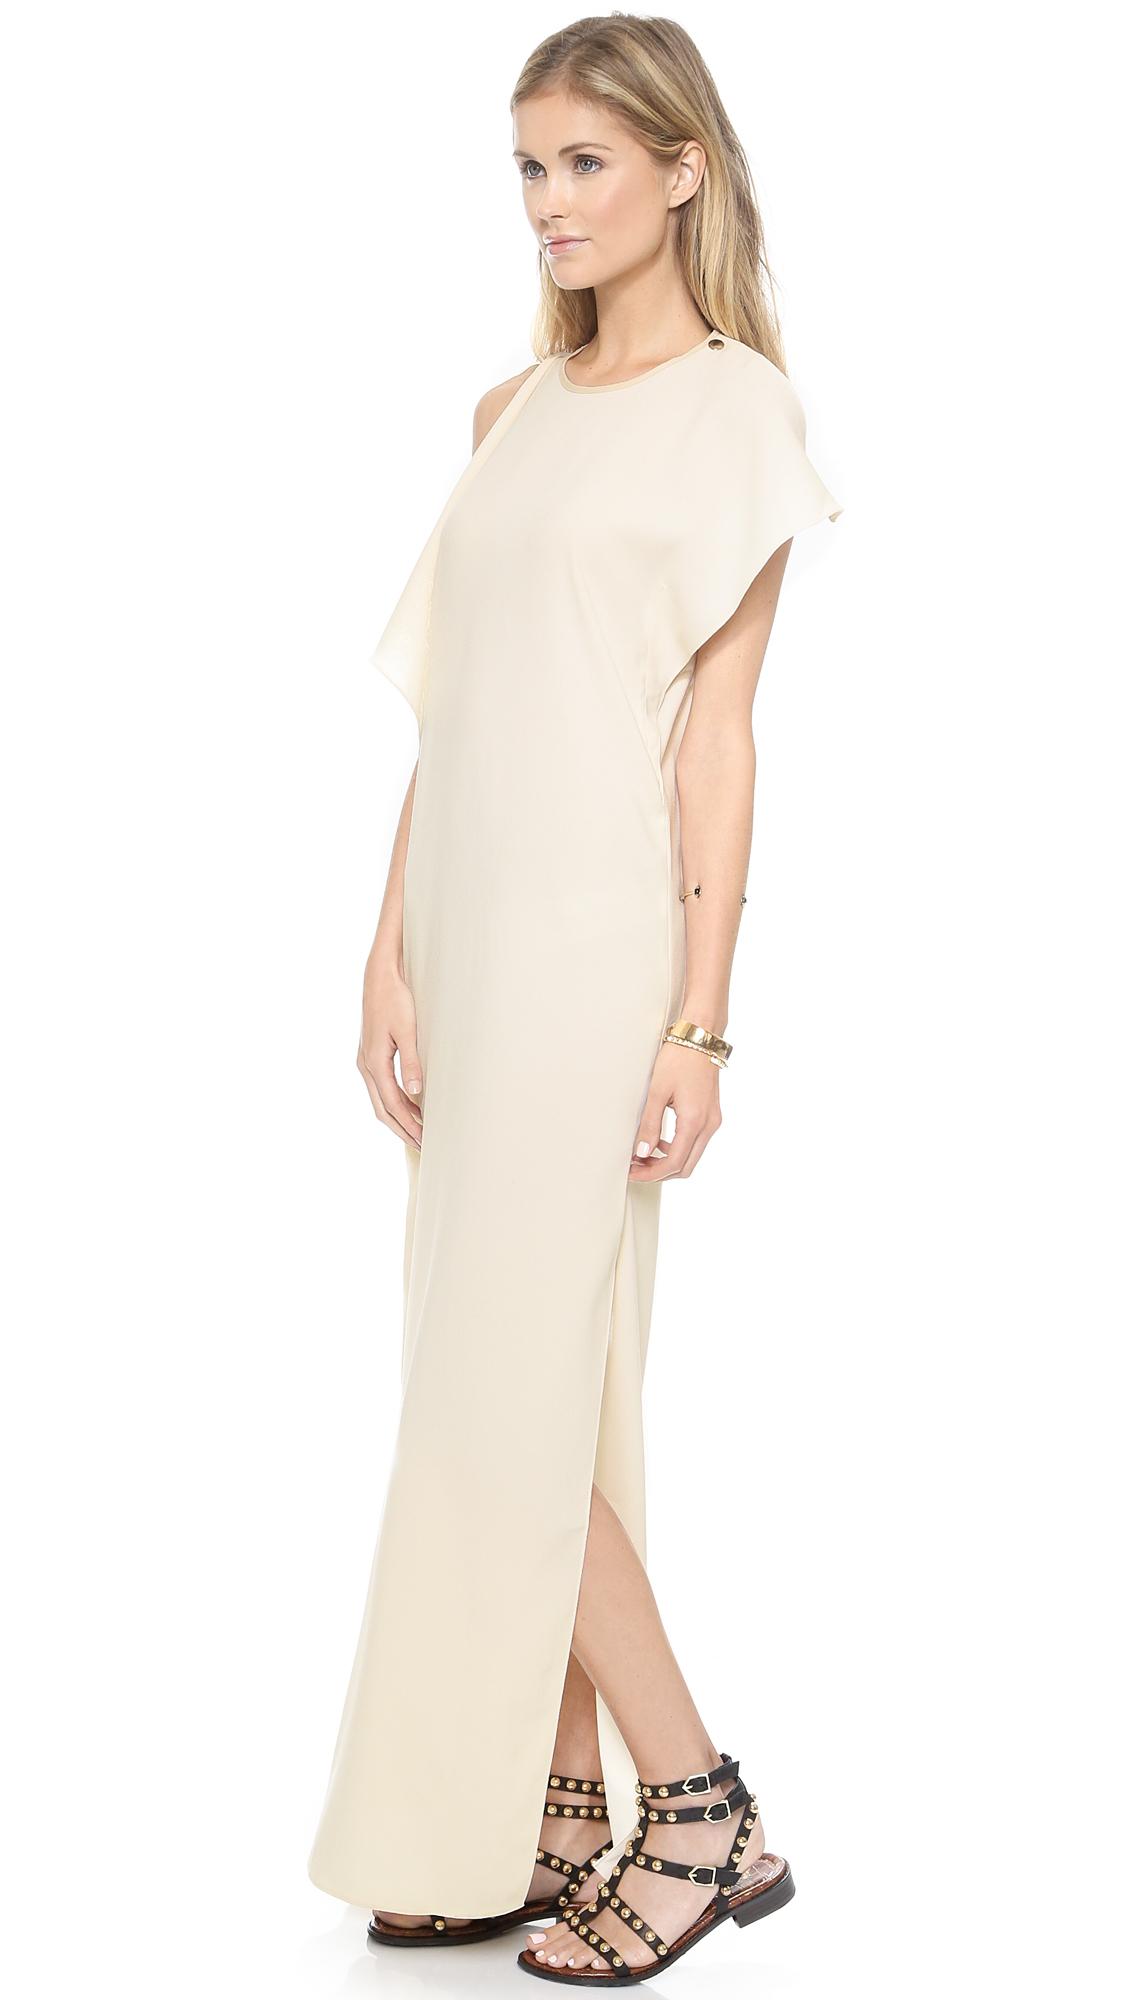 Blaque label ruffle maxi dress